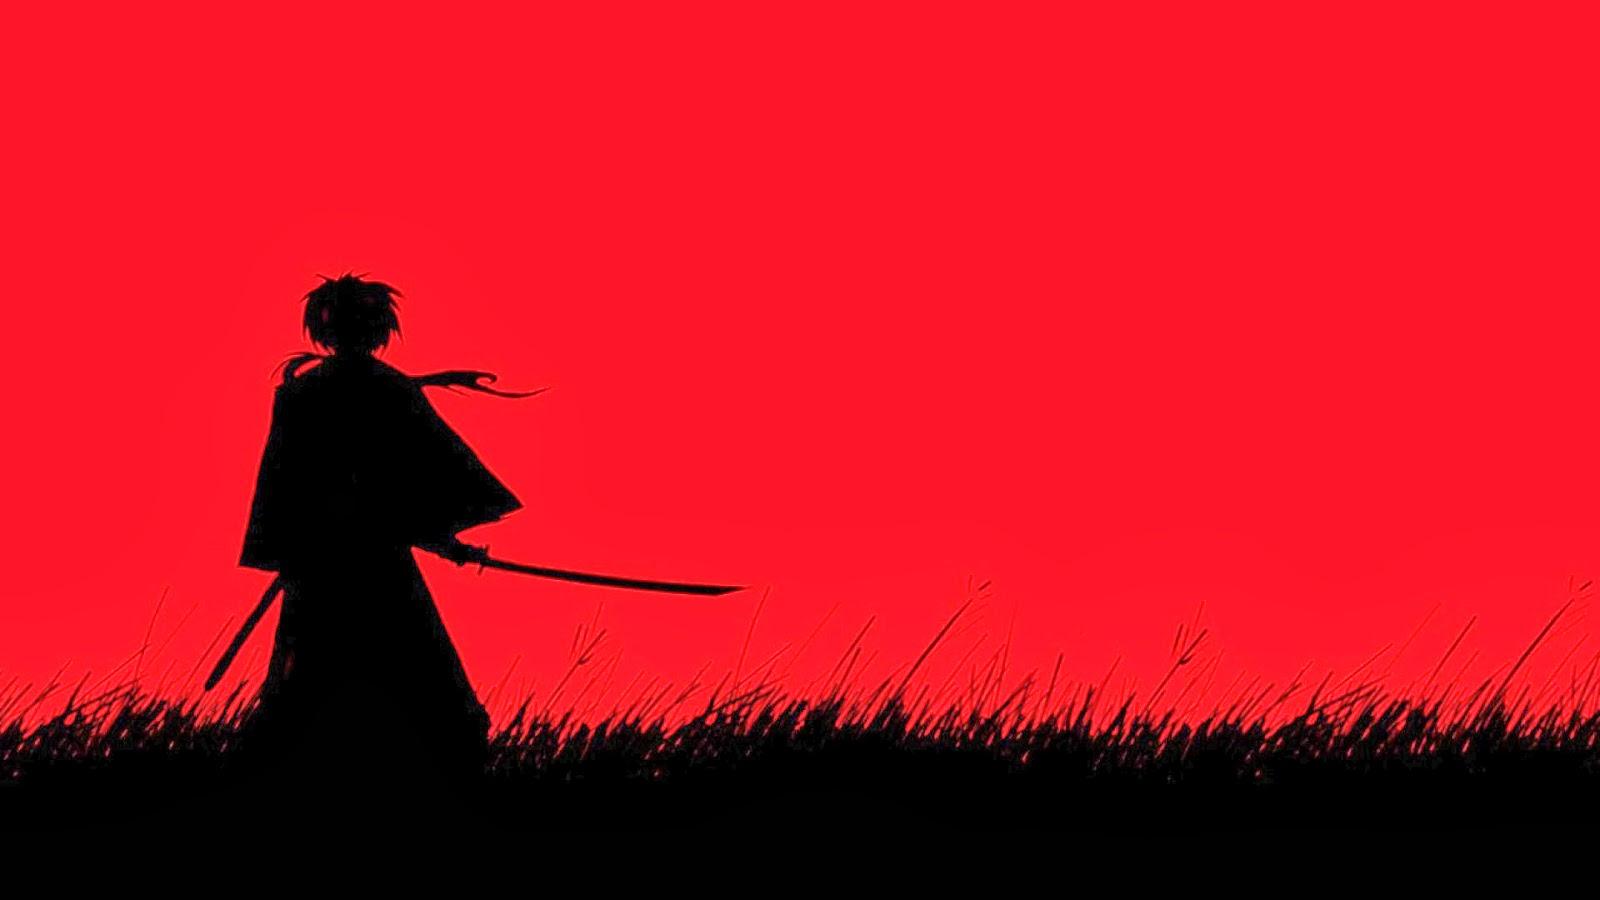 Room Design App Free Samurai X Kenshi Black Amp Red Hd Wallpaper Free